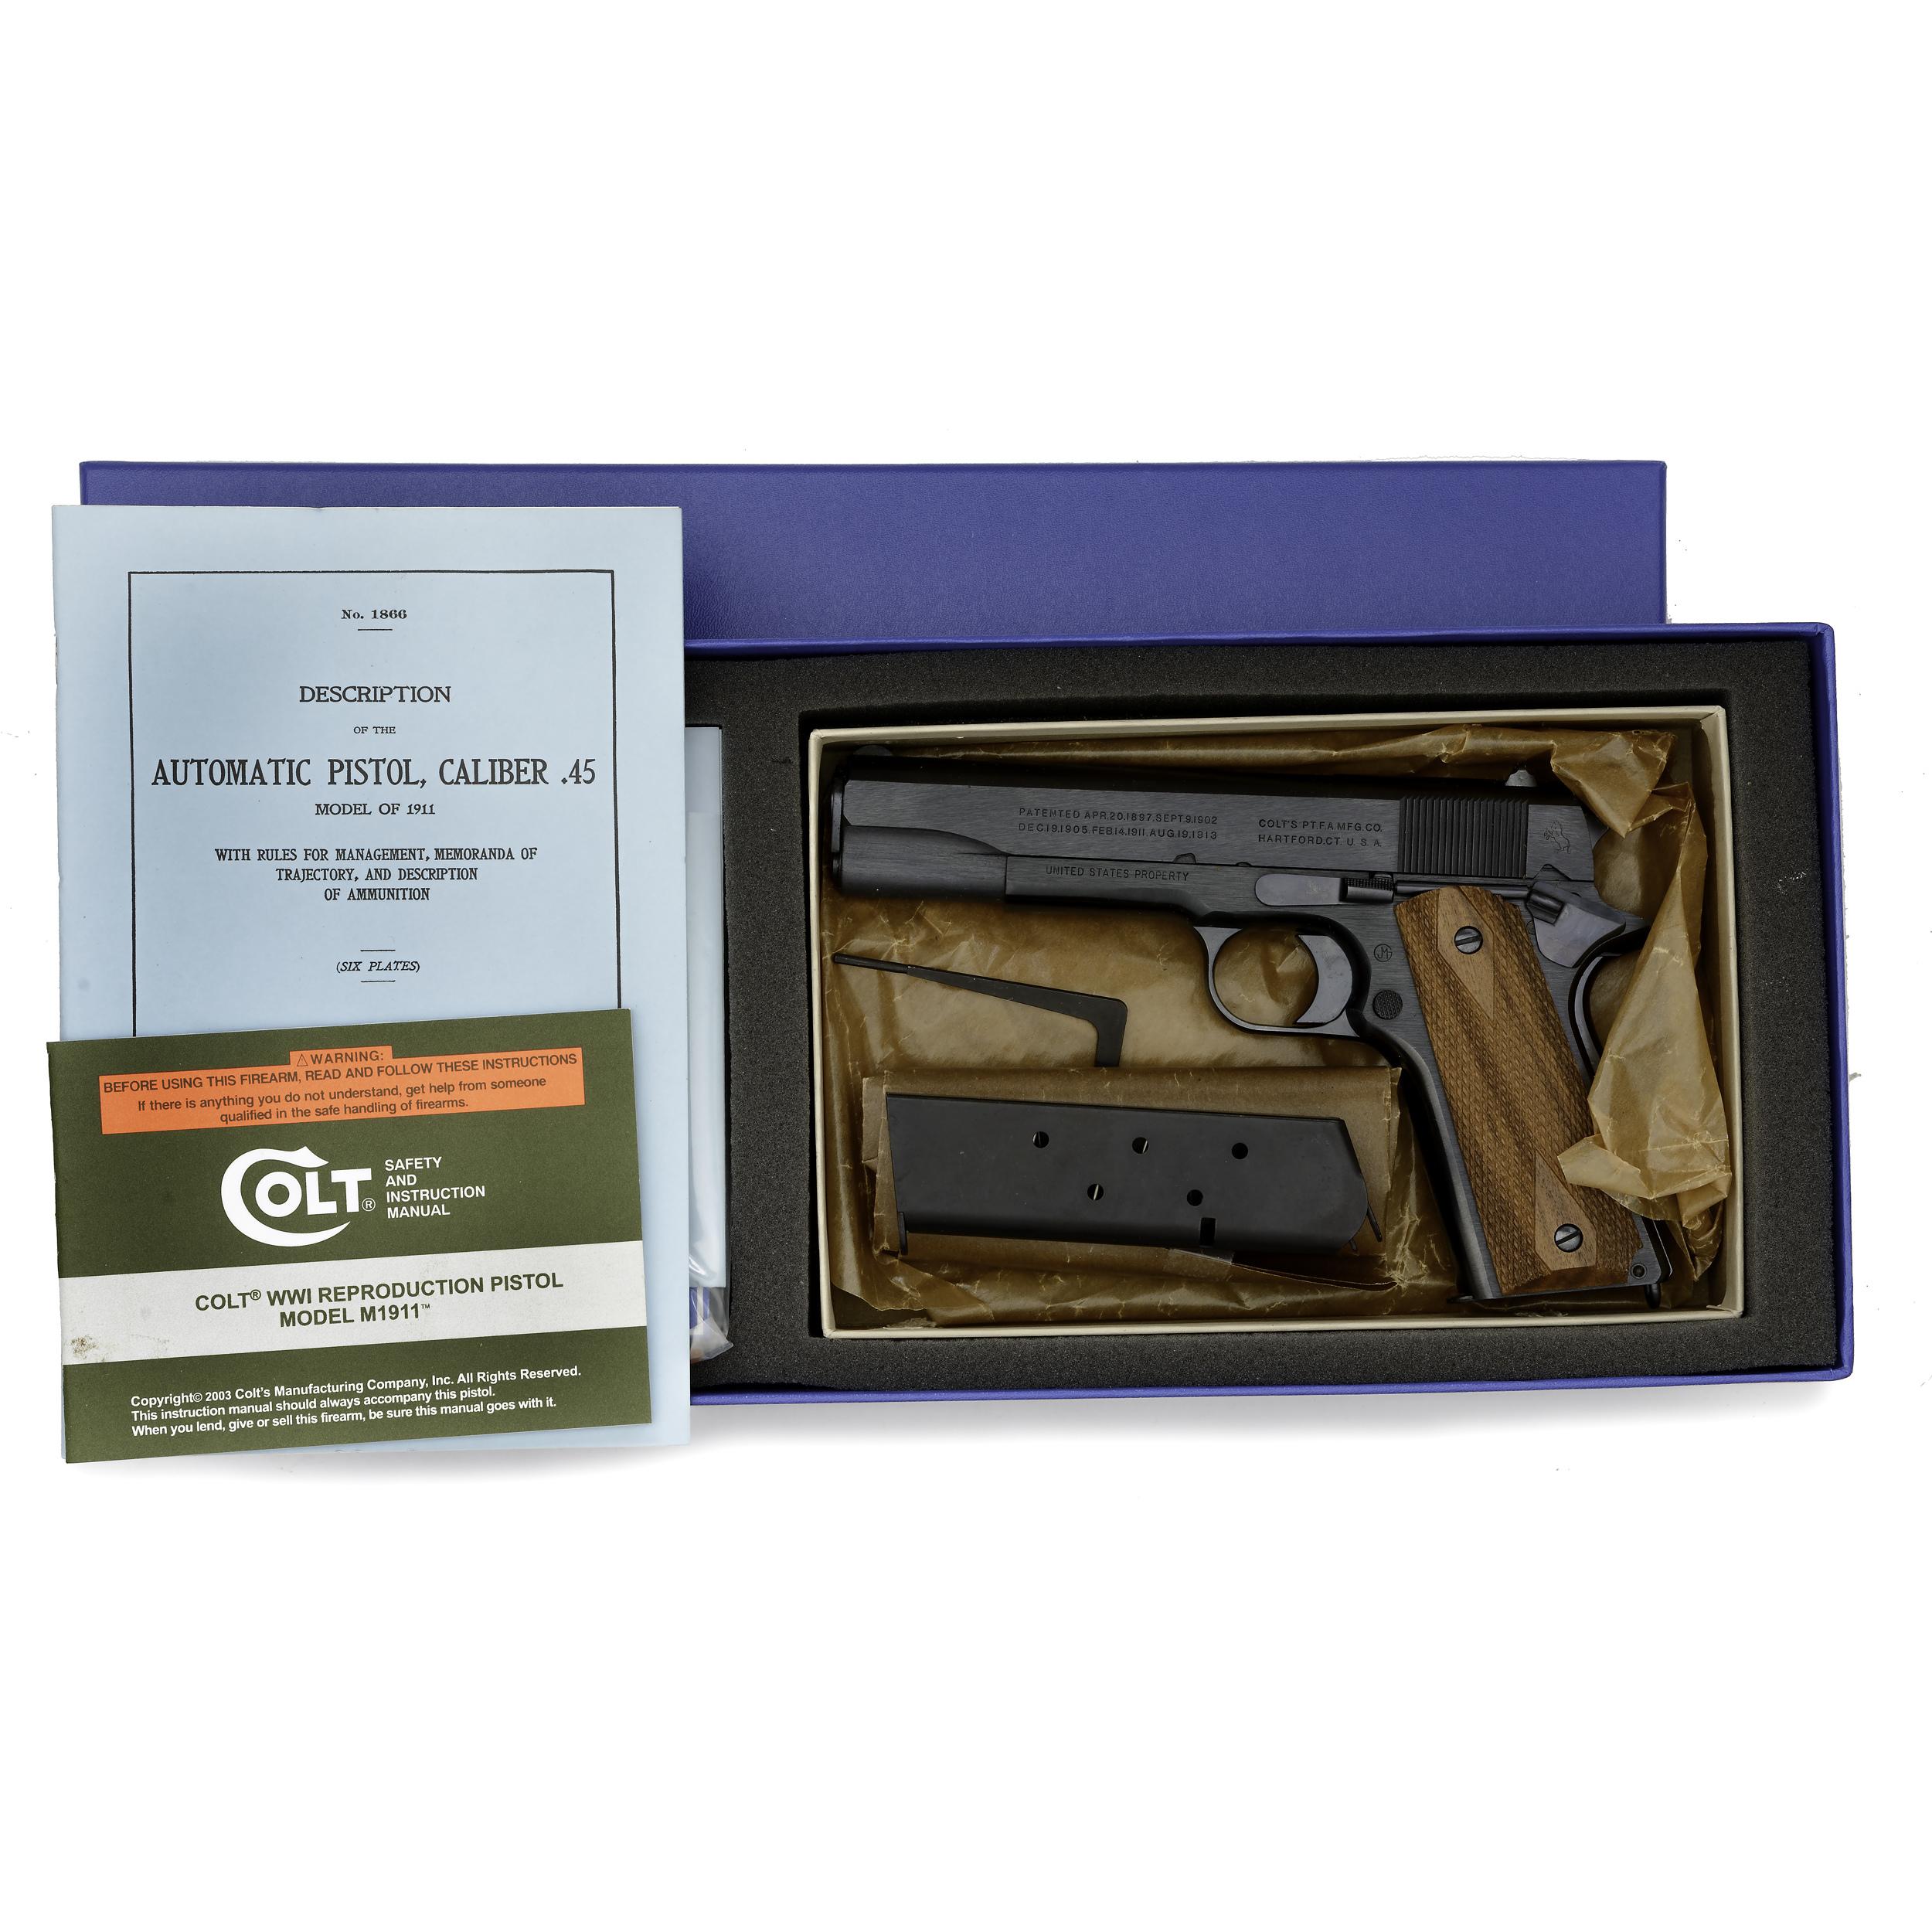 Colt Government Model 1911 WWI Replica Pistol, Carbonia Blue